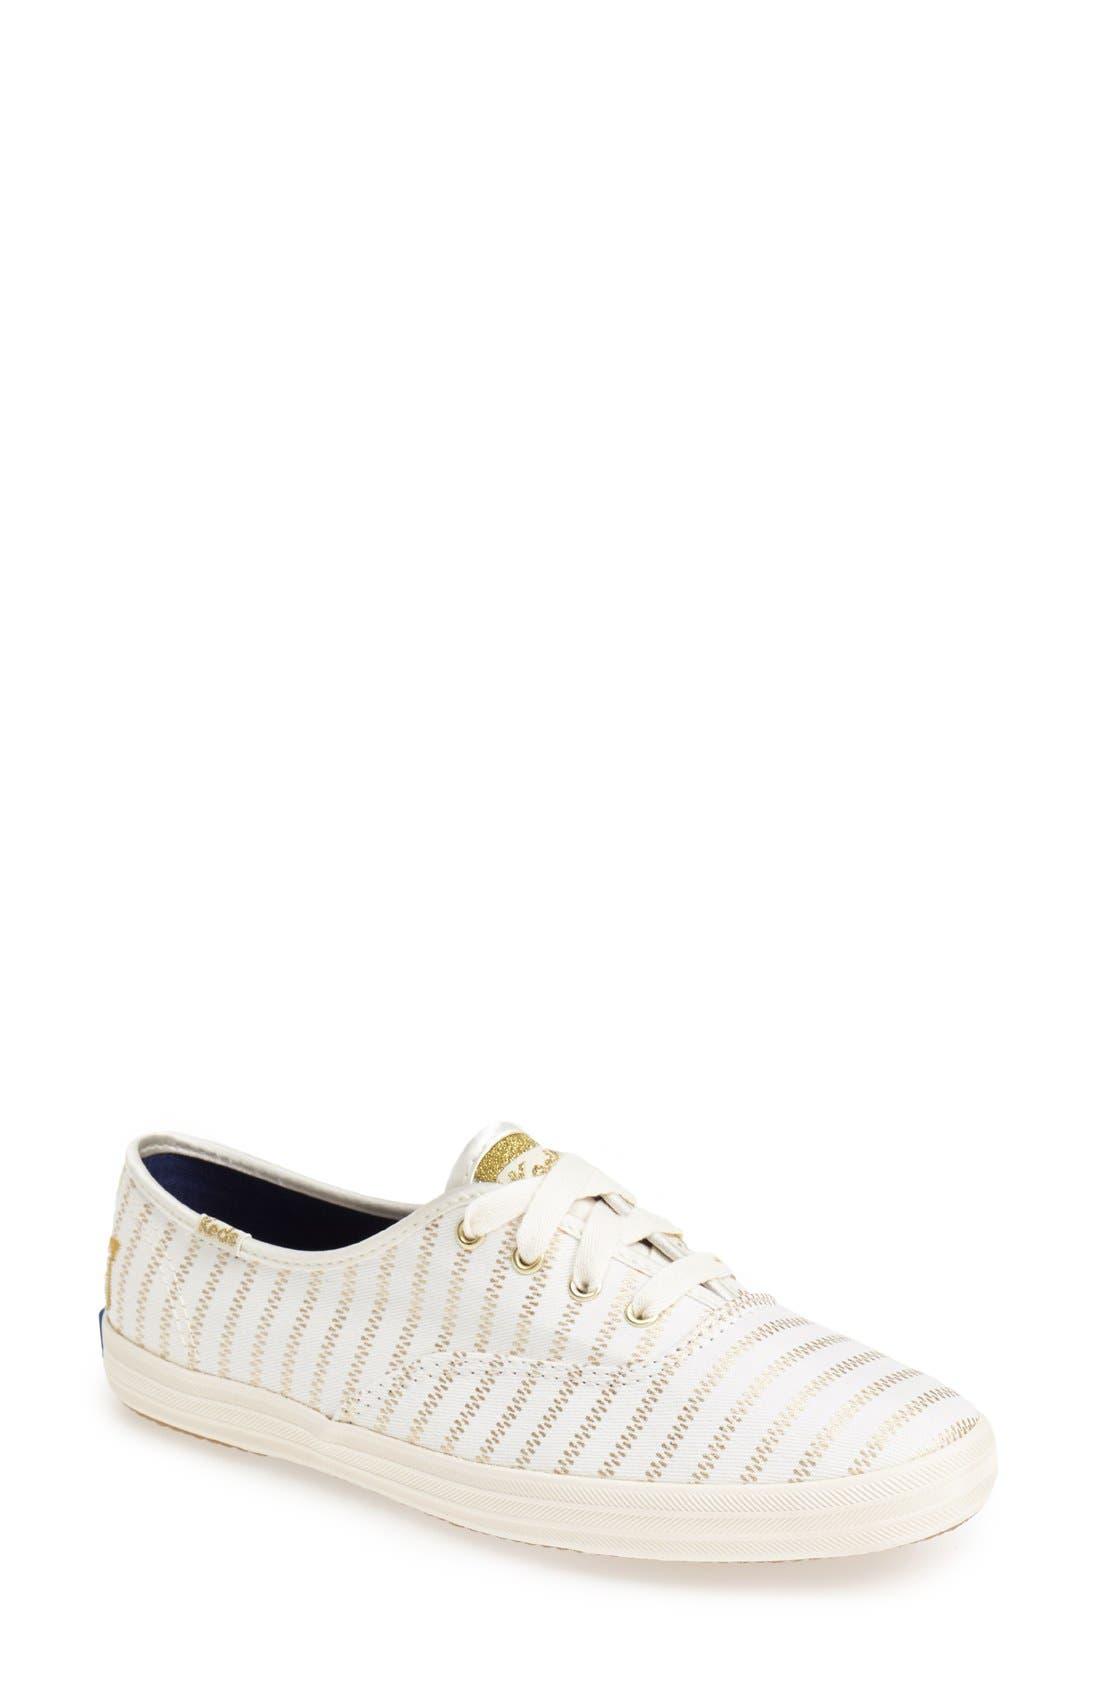 Alternate Image 1 Selected - Keds® 'Champion - Zip Zipper' Sneaker (Women)